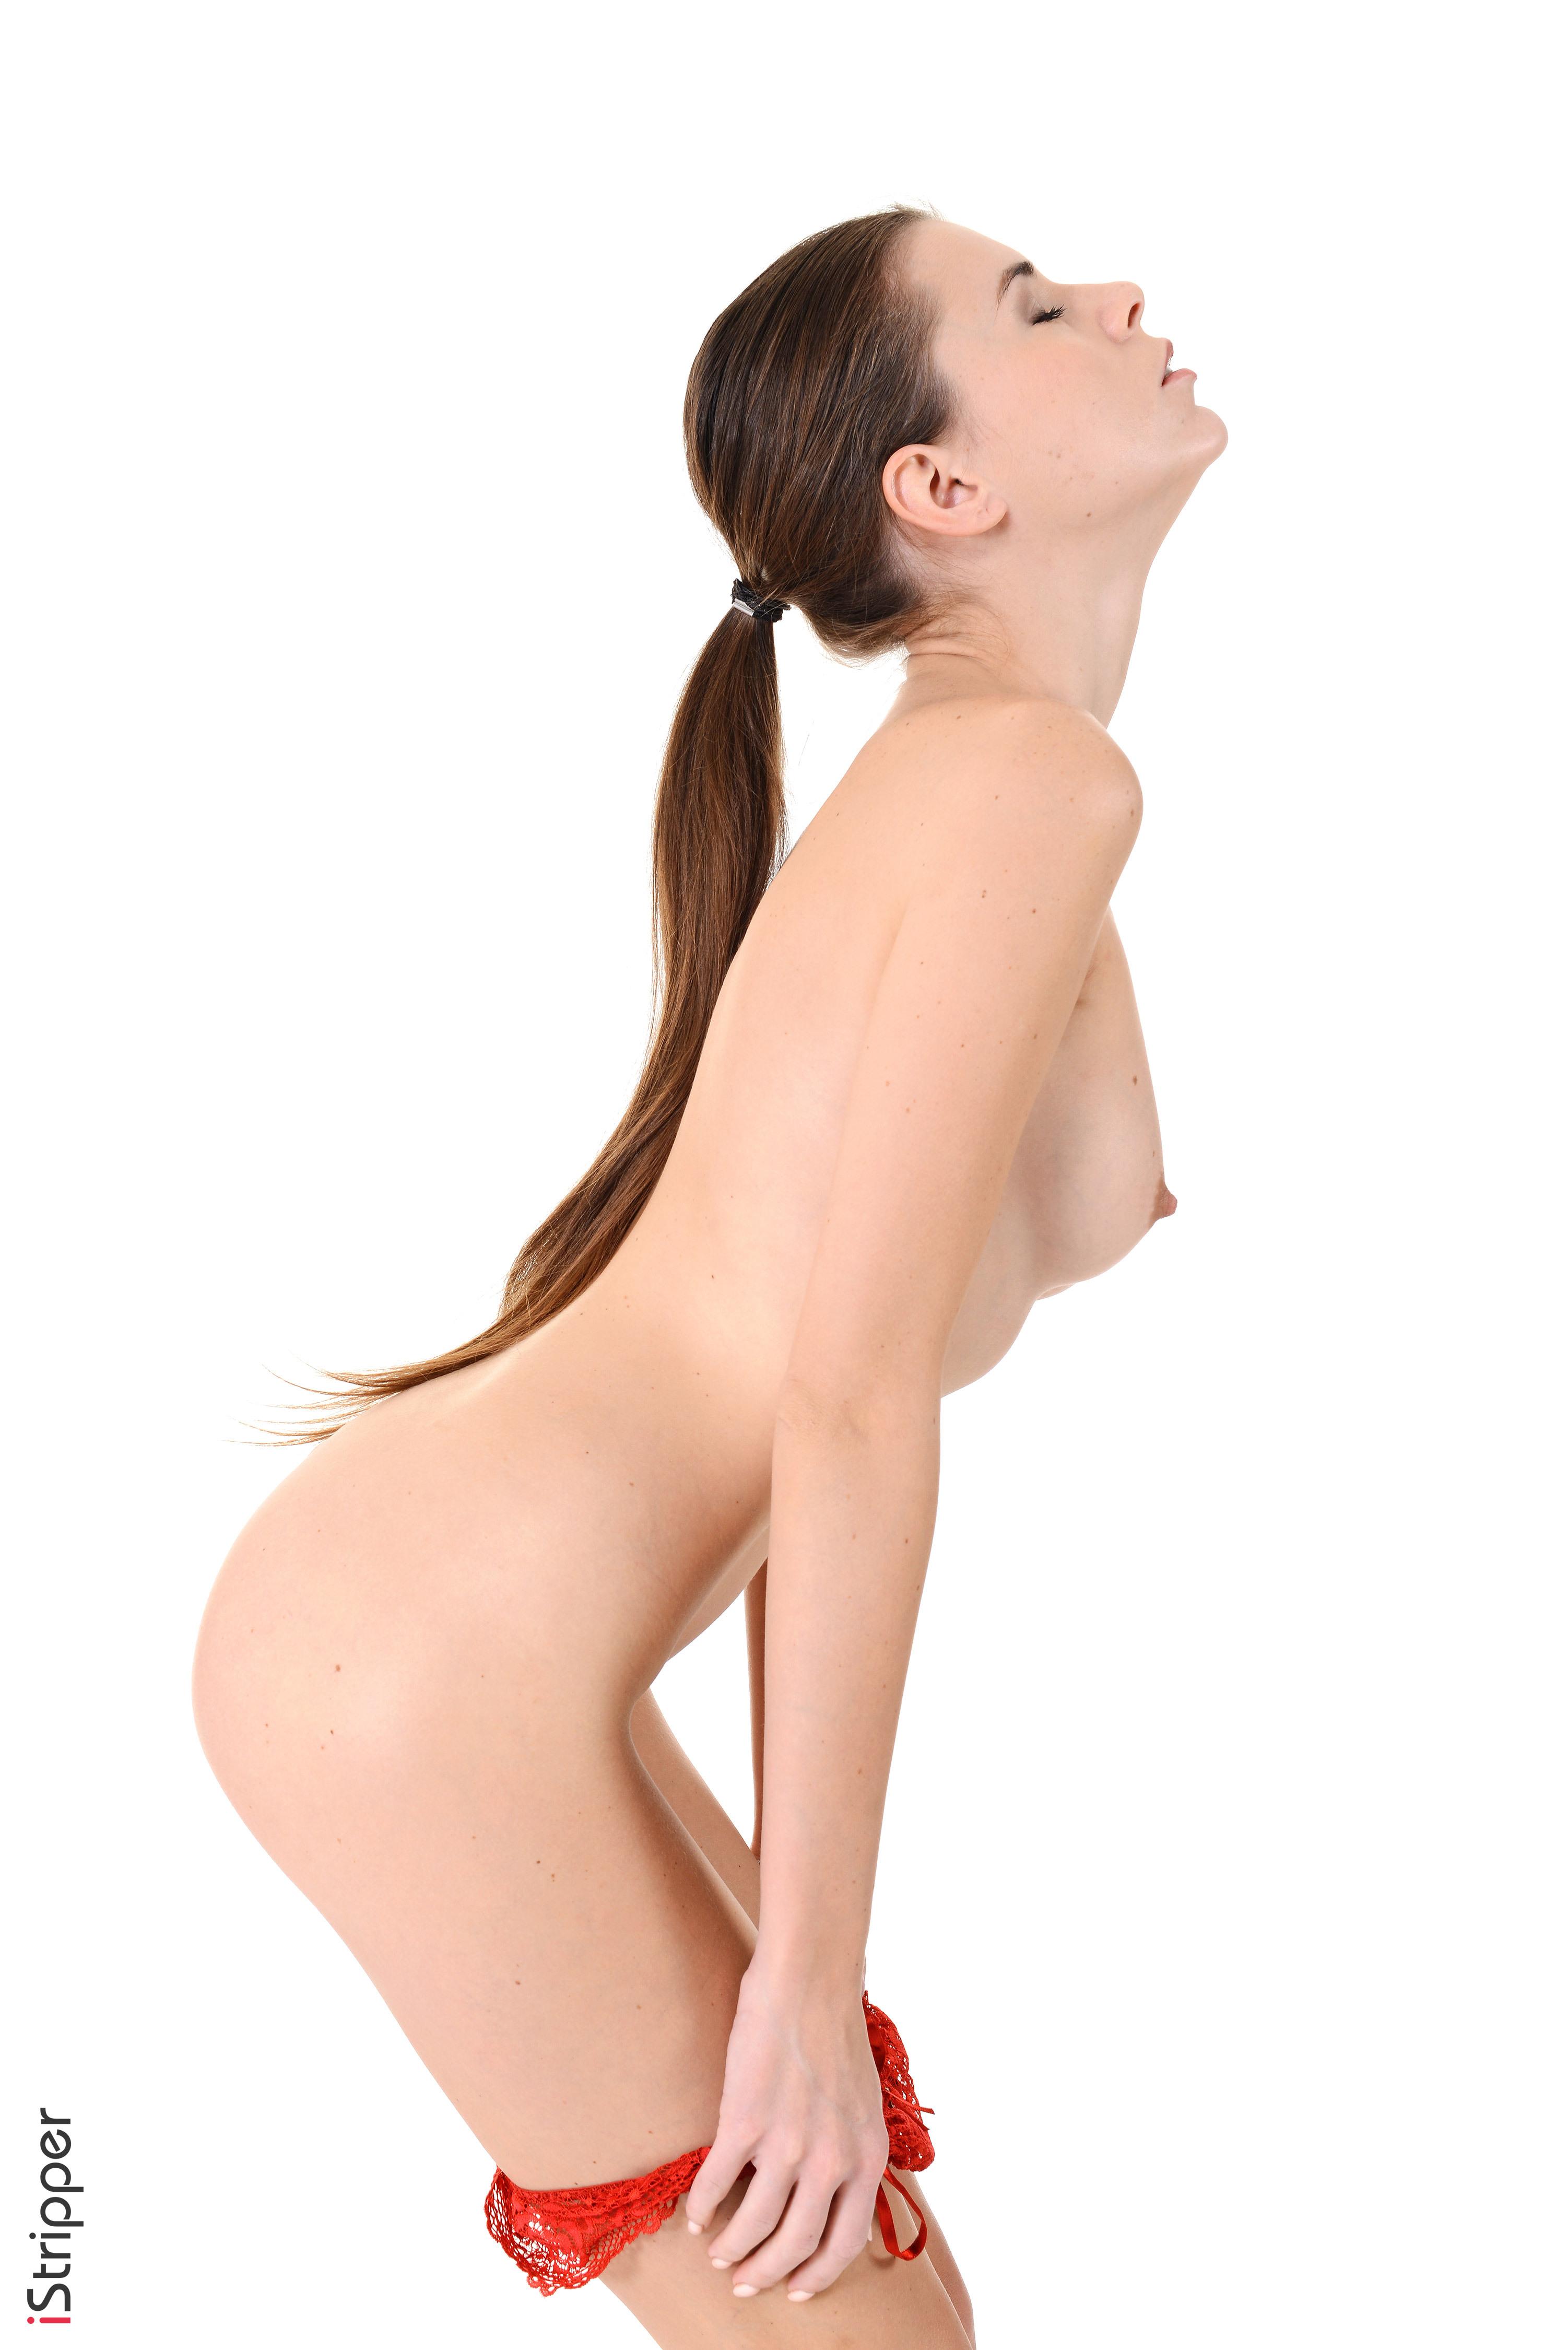 hot girl nude wallpaper